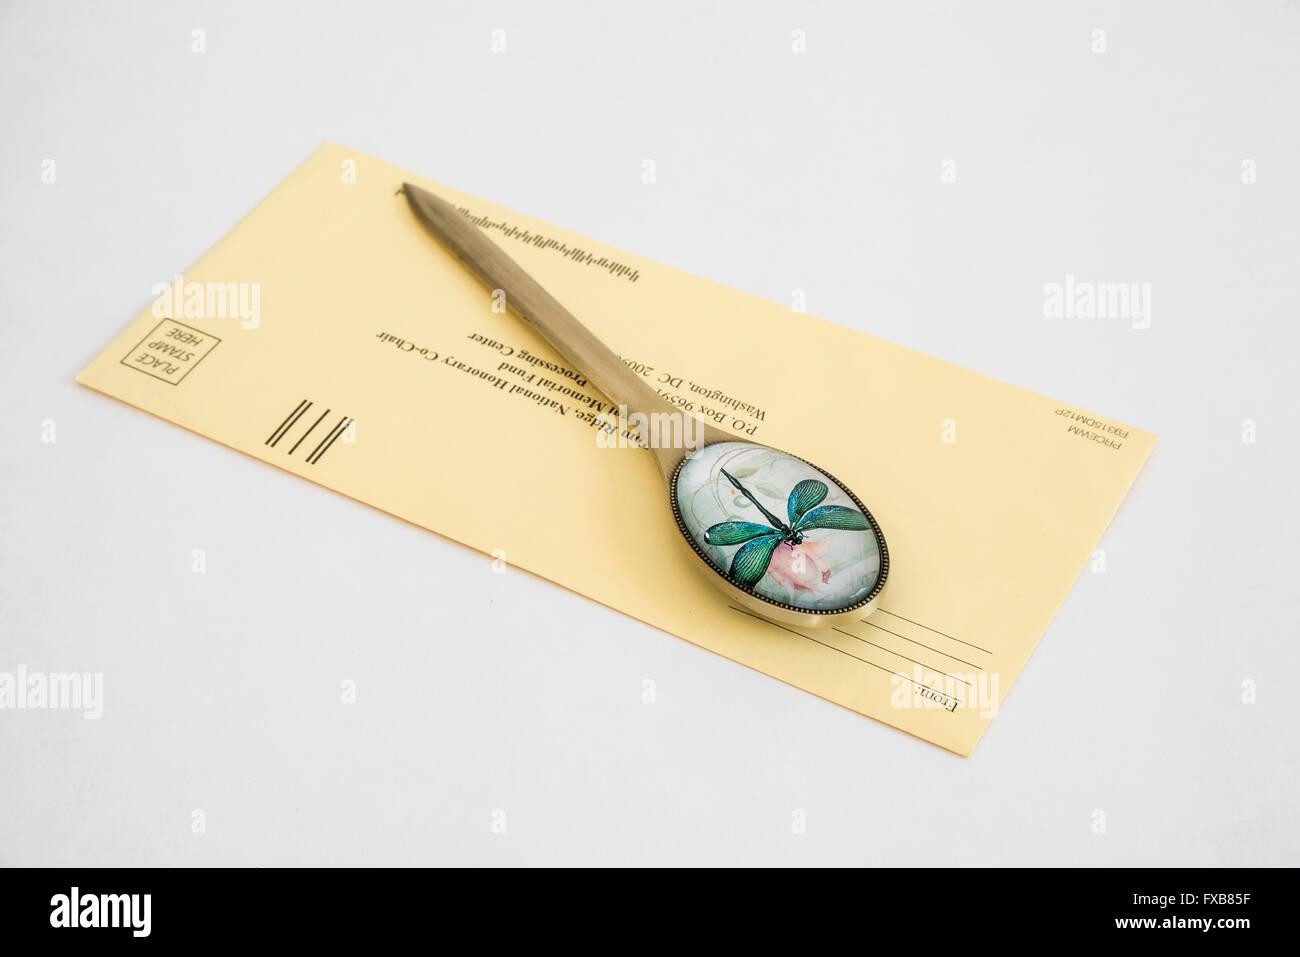 Stylish Letter Envelope Opener Knife  with Floral Designed Handle, Office Desk Accessories - Stock Image